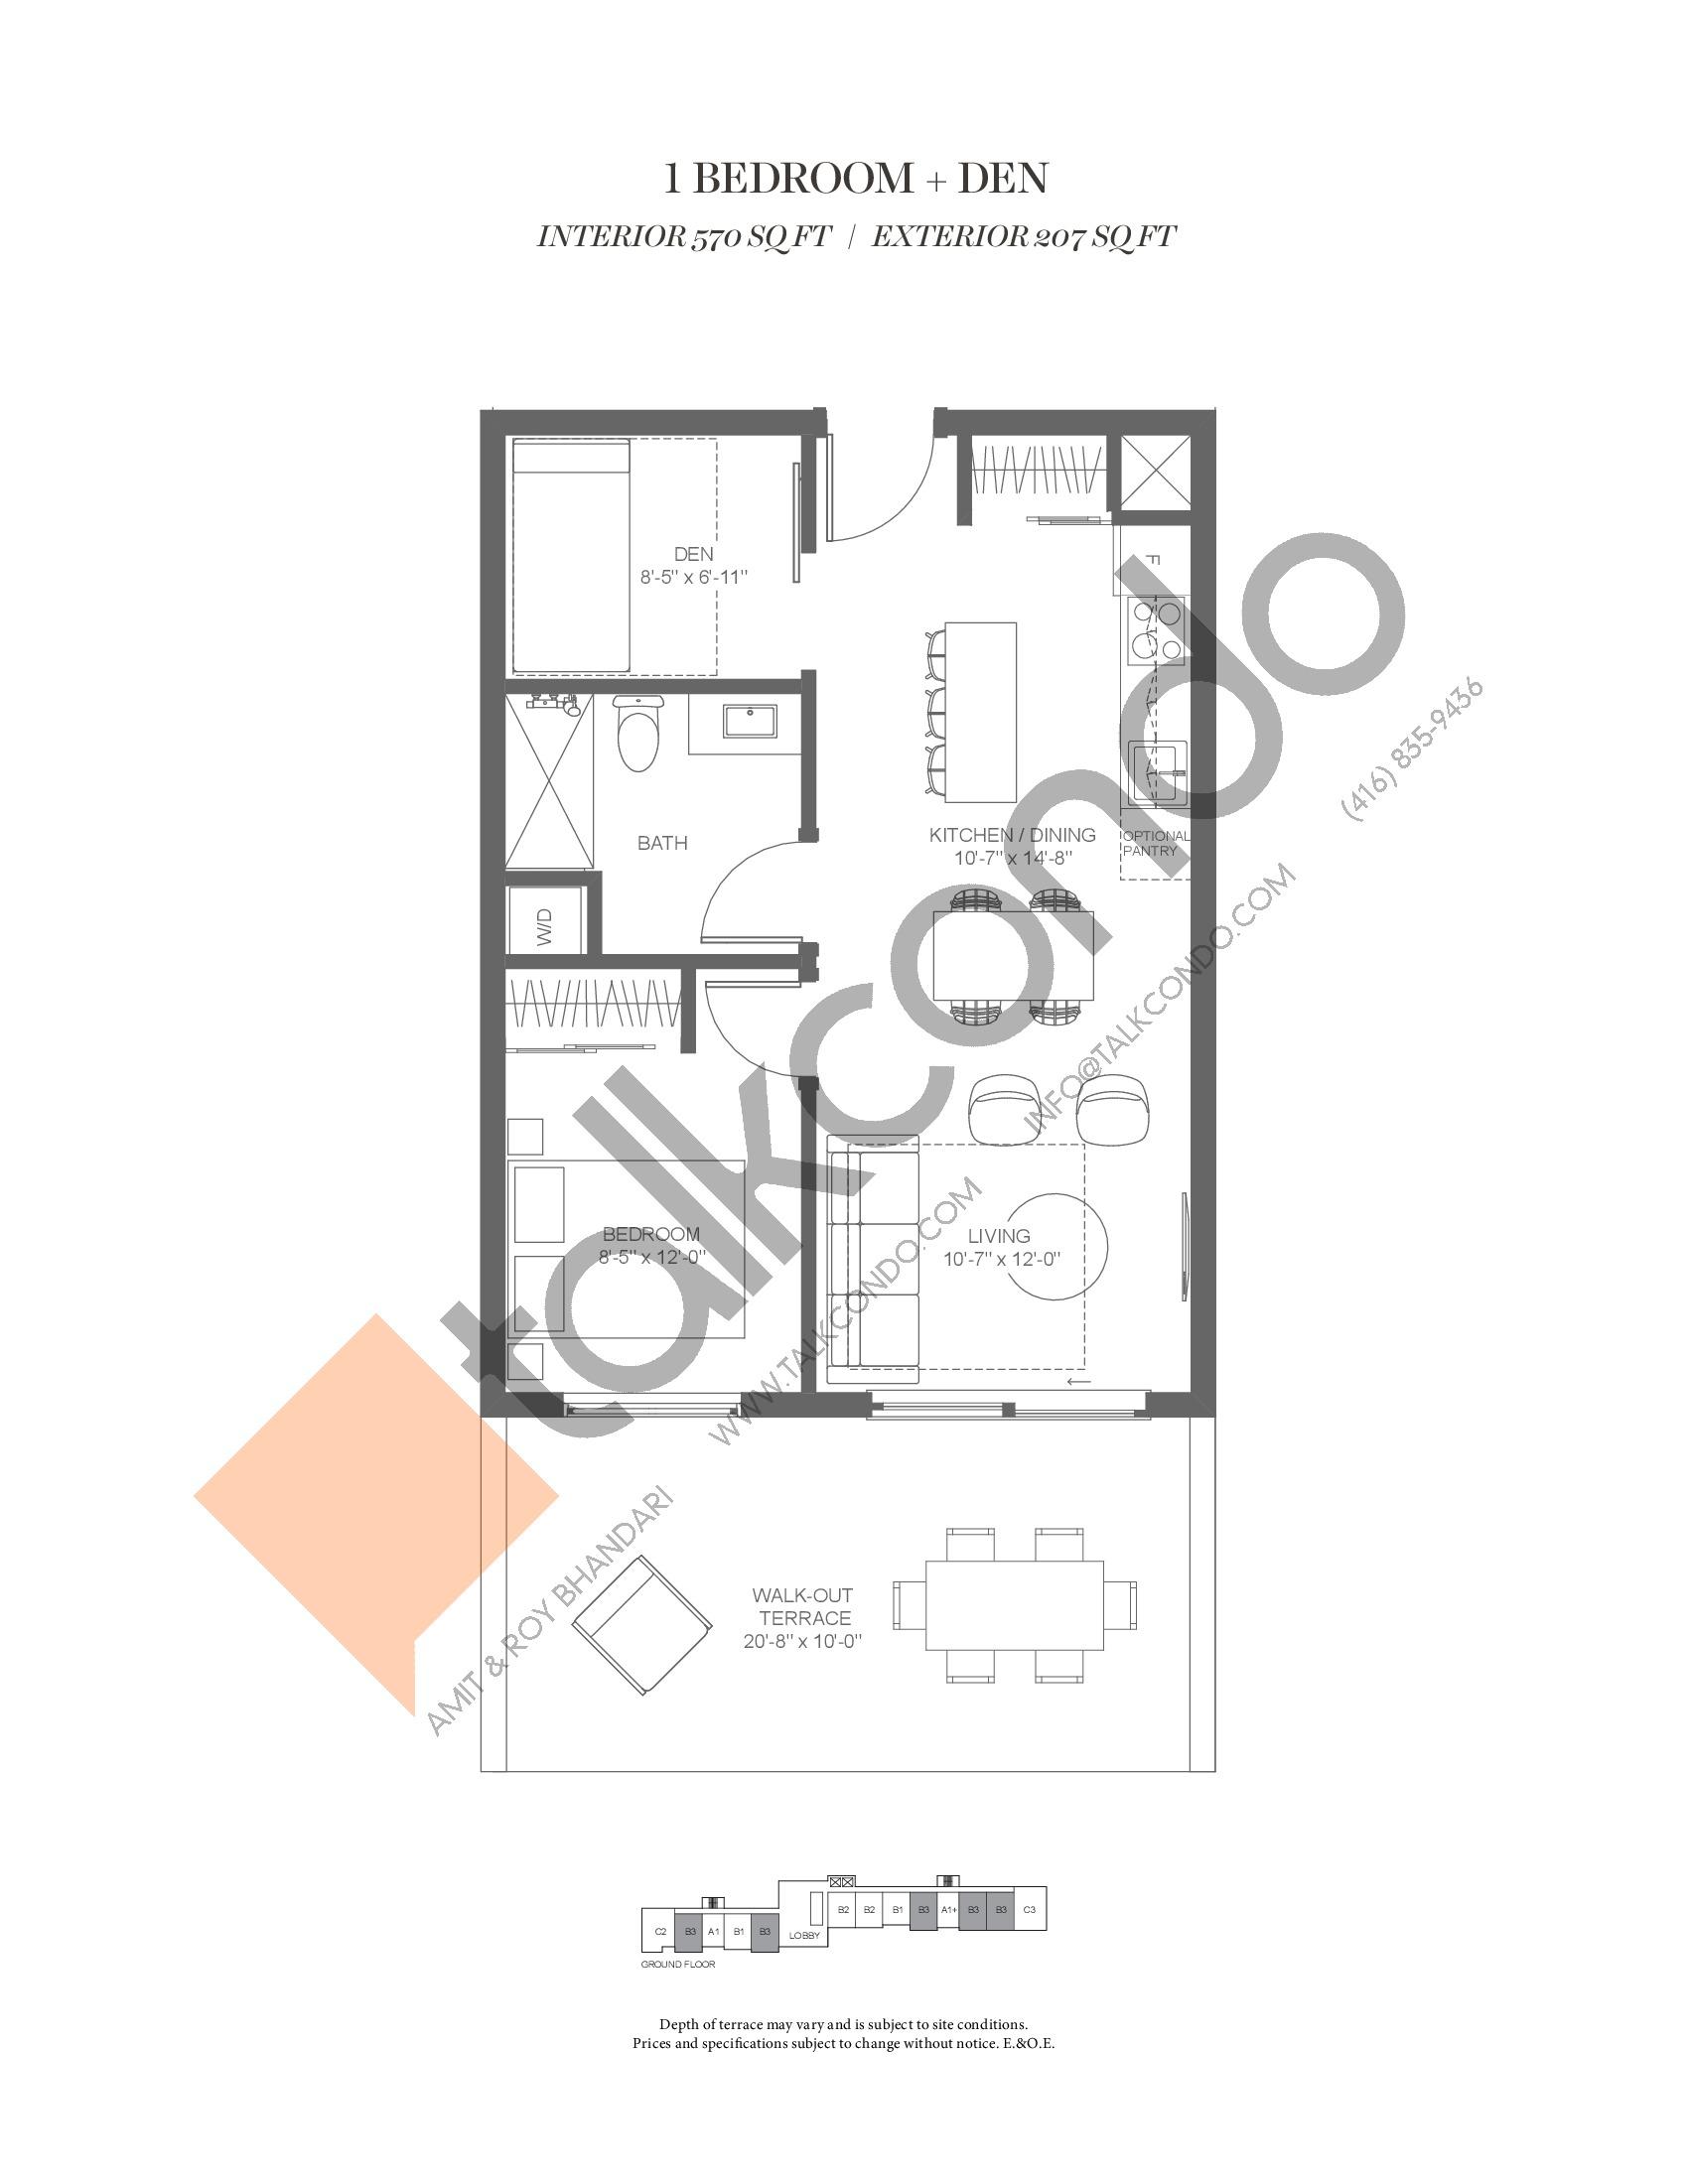 B3 (Fairway Collection) Floor Plan at Muskoka Bay Resort - 570 sq.ft